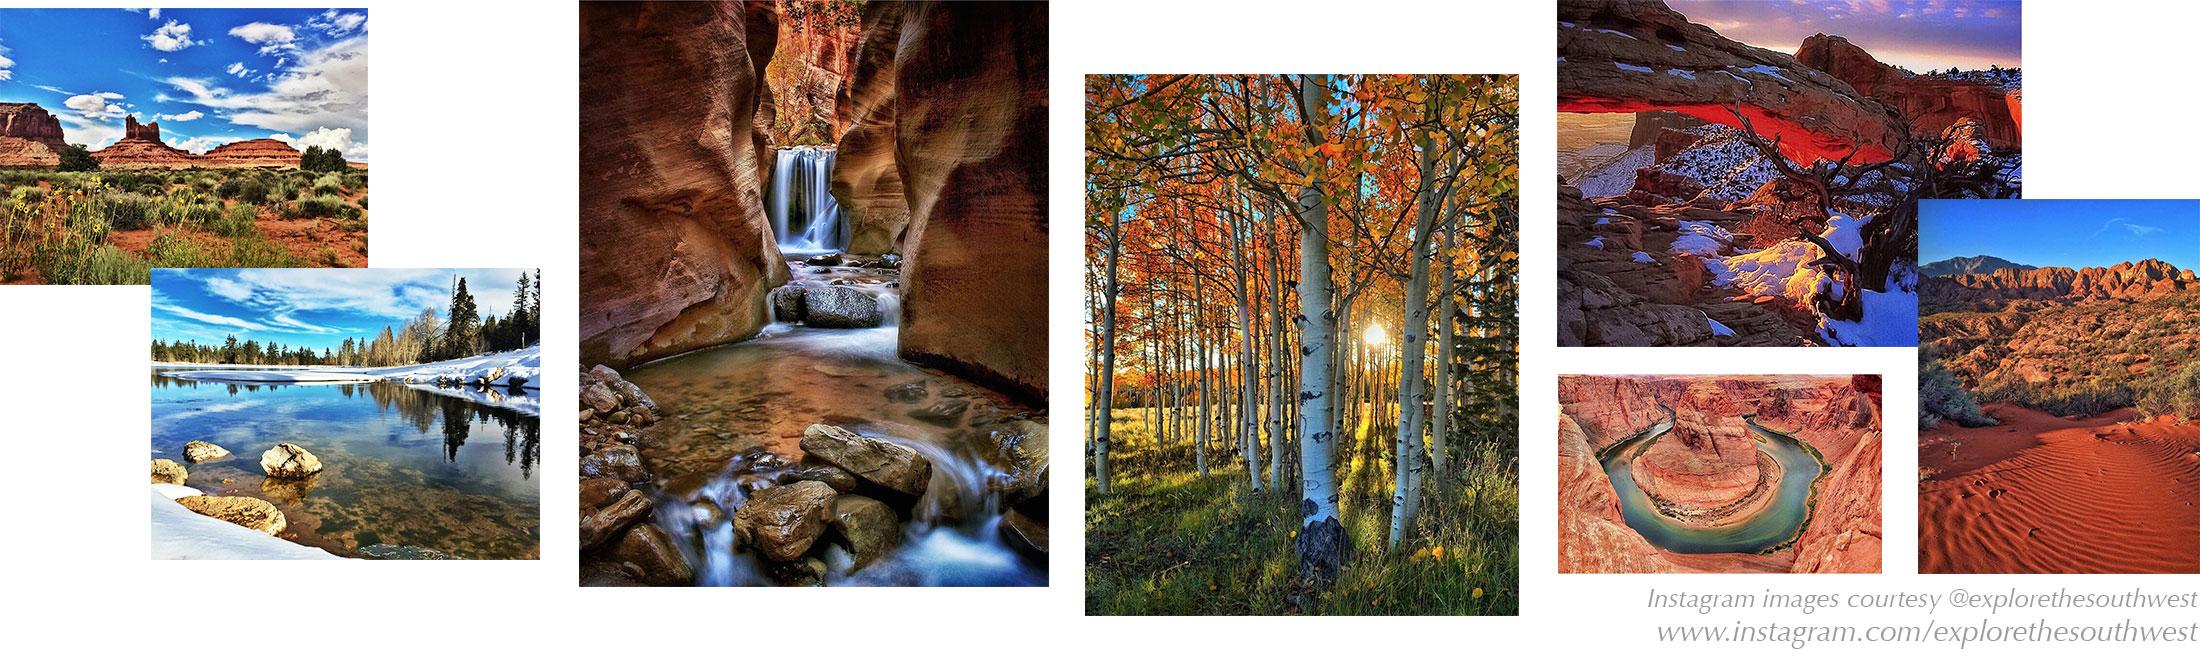 St. George, Utah and the US Southwest